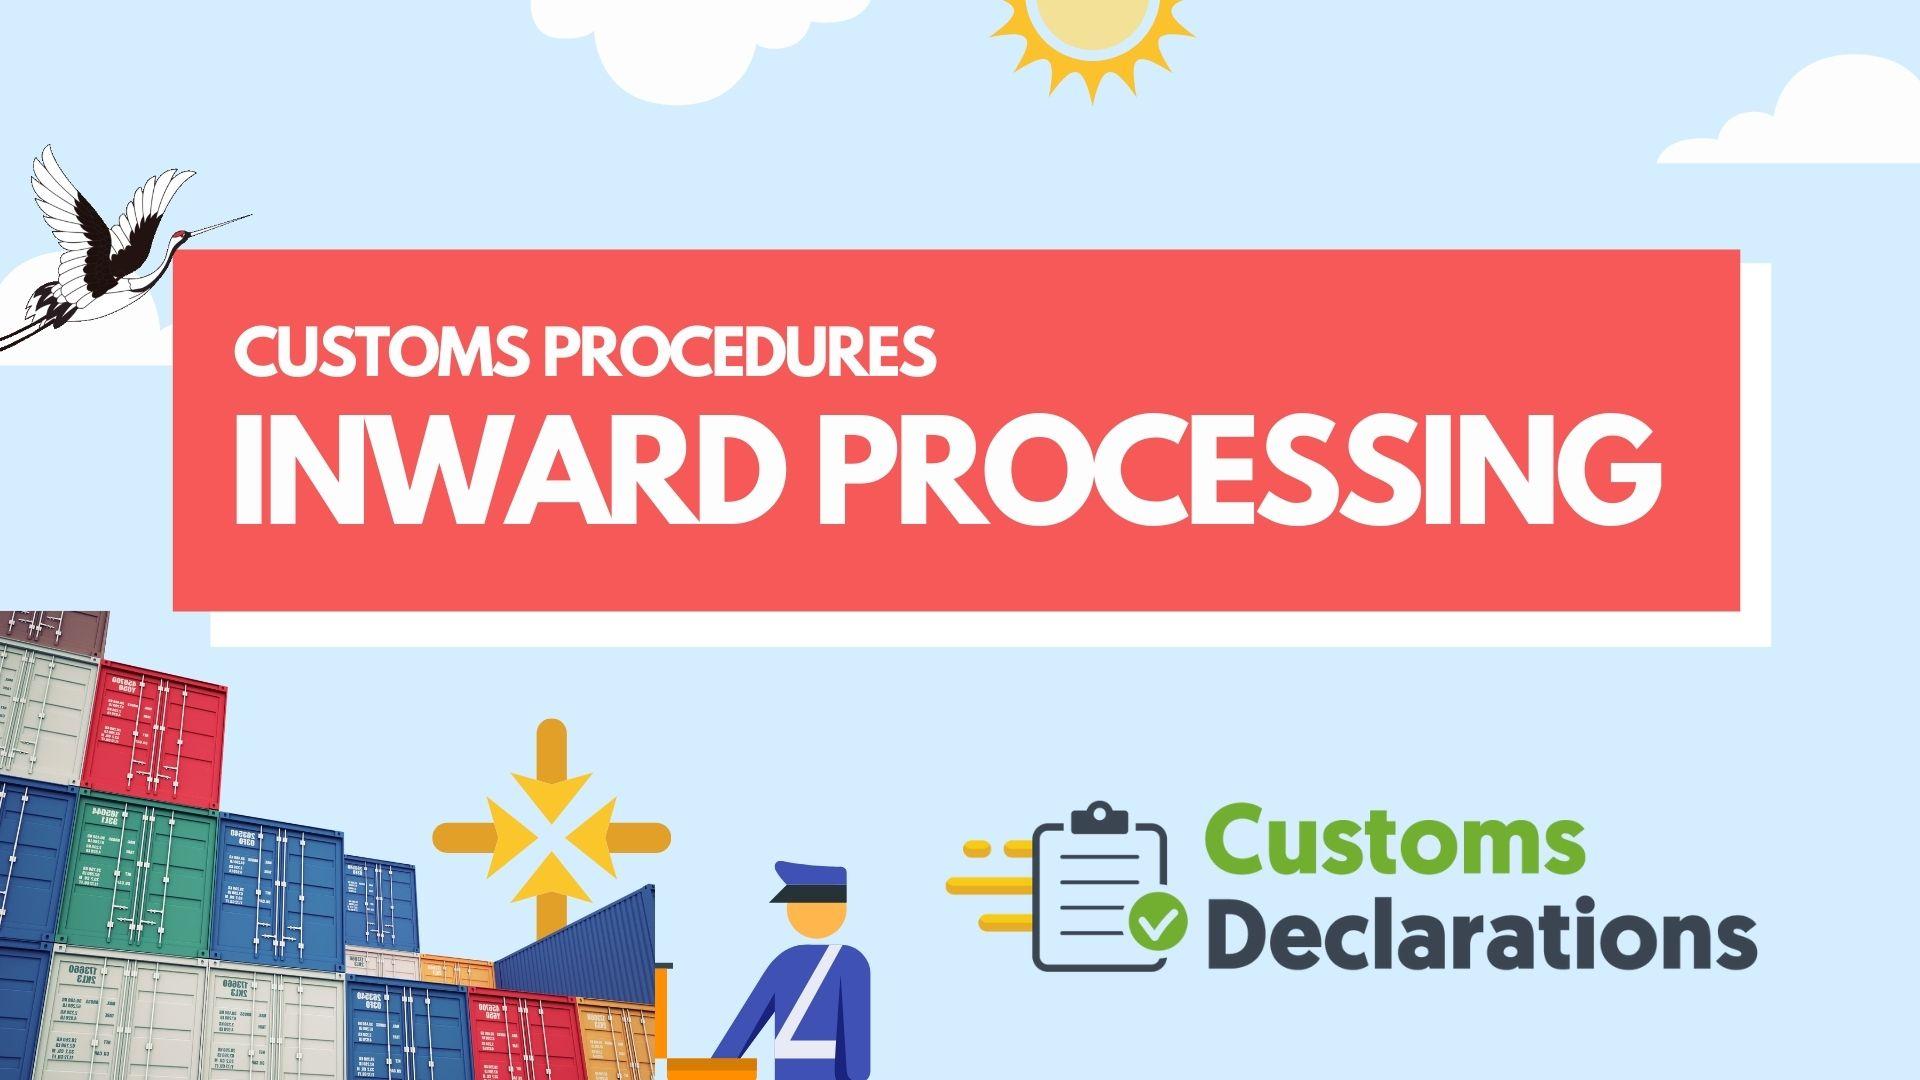 Customs Procedures Inward Processing